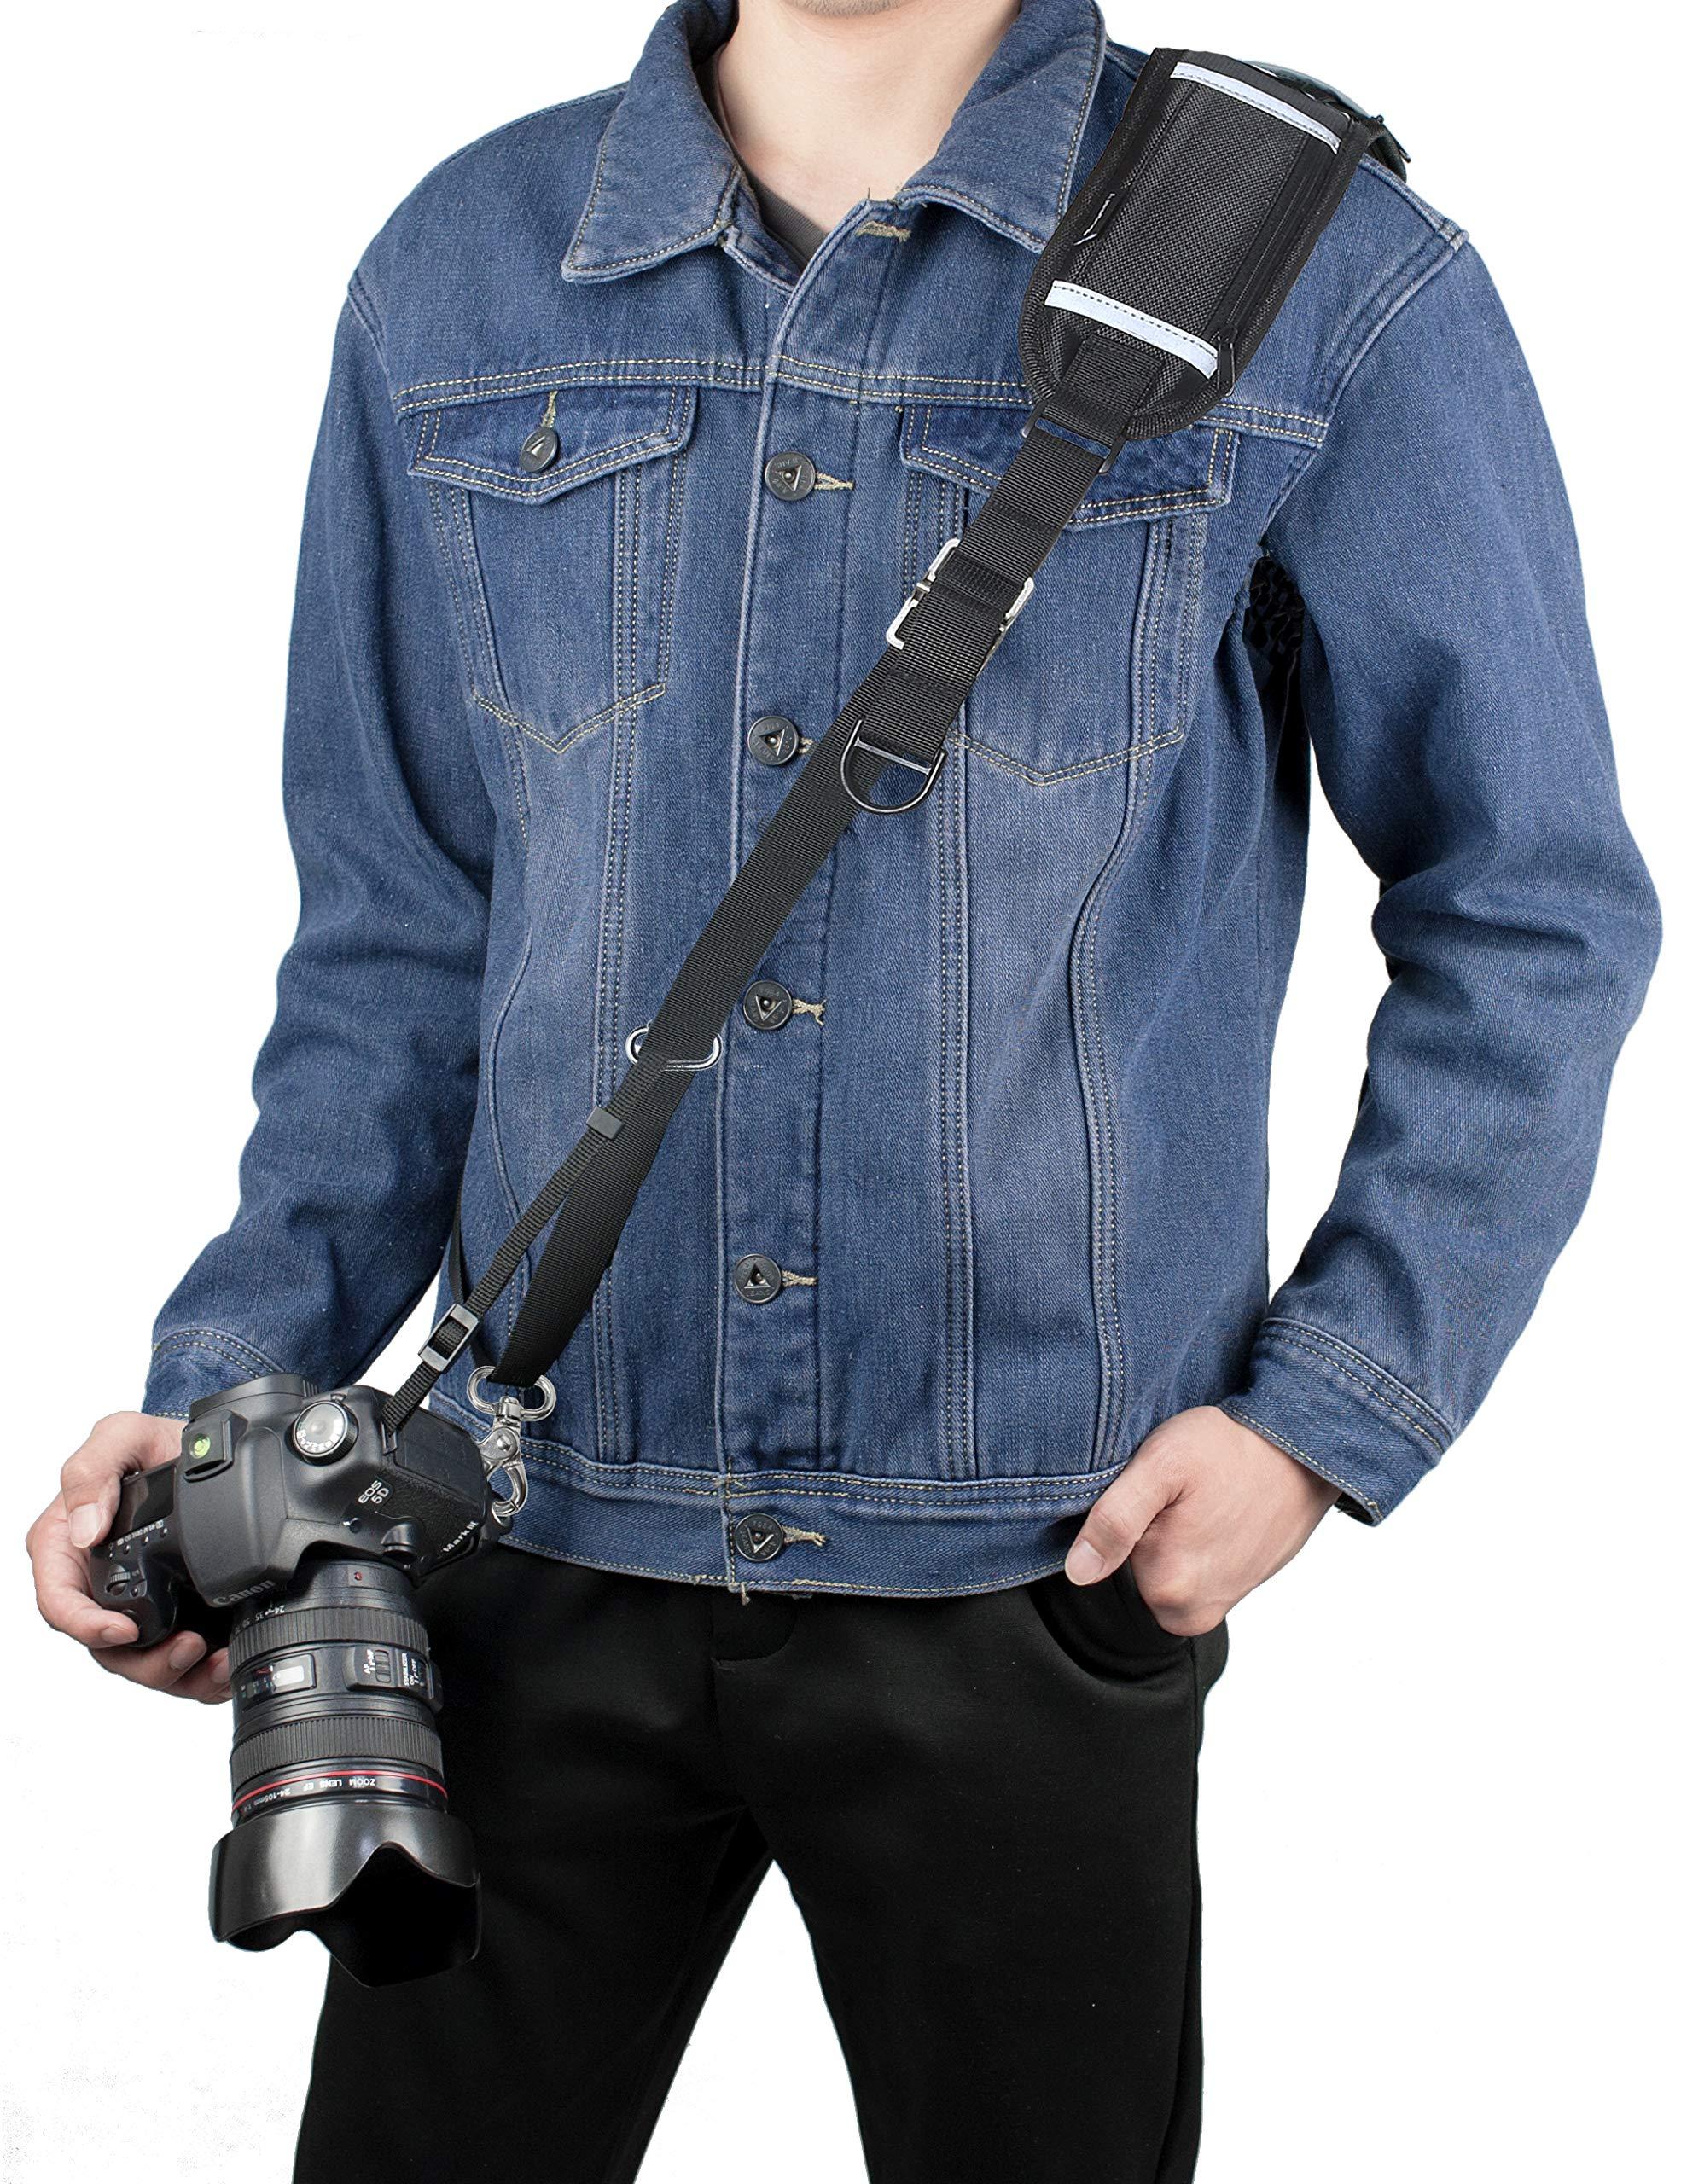 Sugelary Camera Strap, Long Shoulder Neck Sling Strap Quick Release DSLR Strap for Canon Nikon Sony Mirrorless Camera (Shoulder Neck Strap) by Sugelary